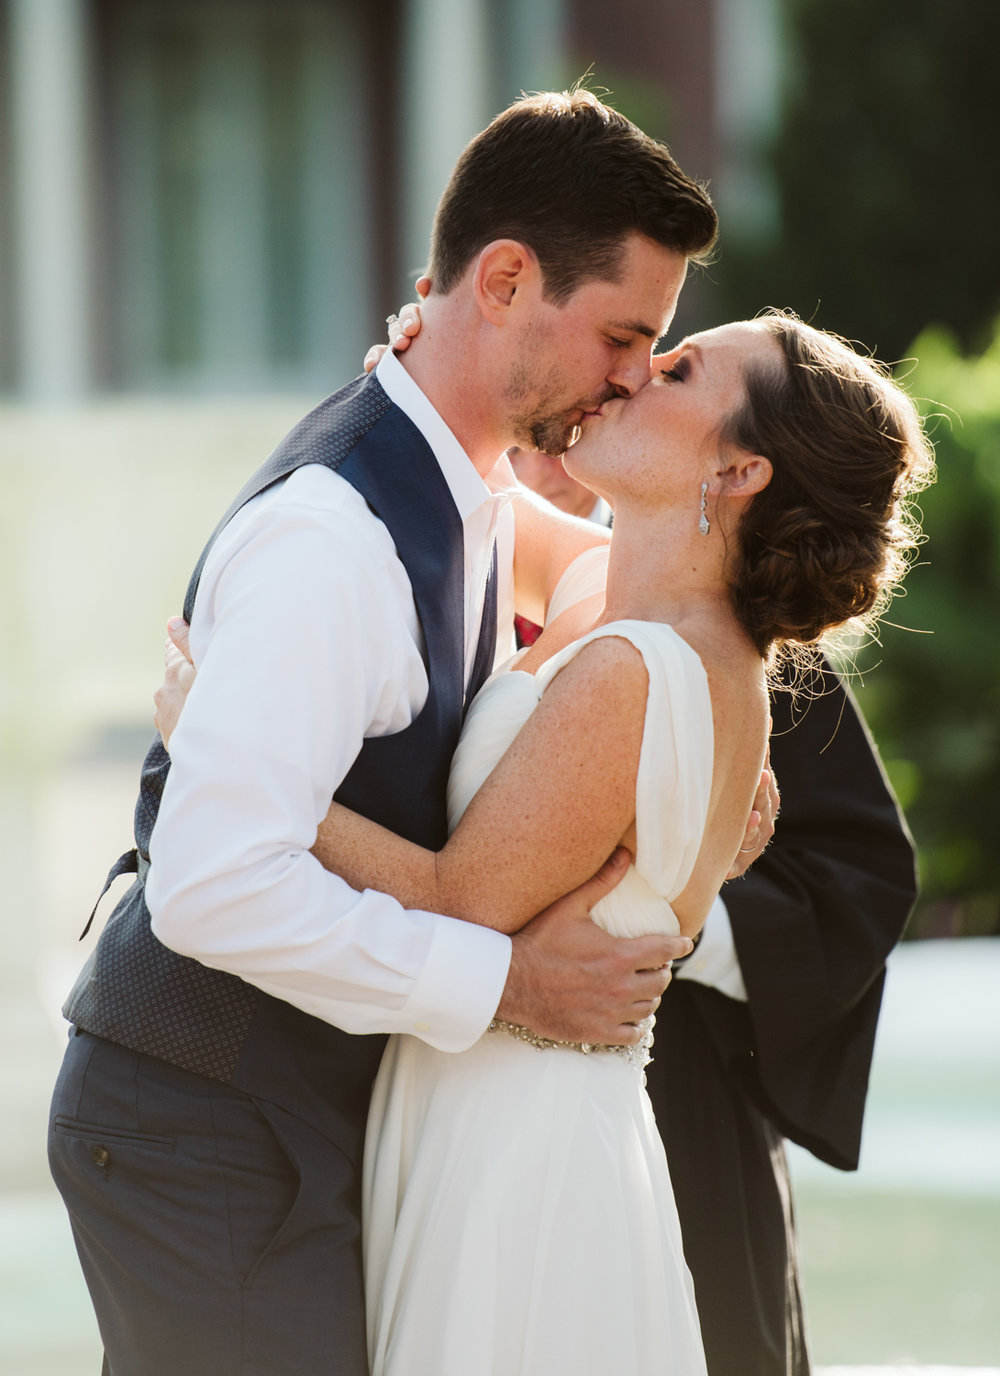 emily_alex_elm_bank_wedding_wellesley_DSC_7801.jpg